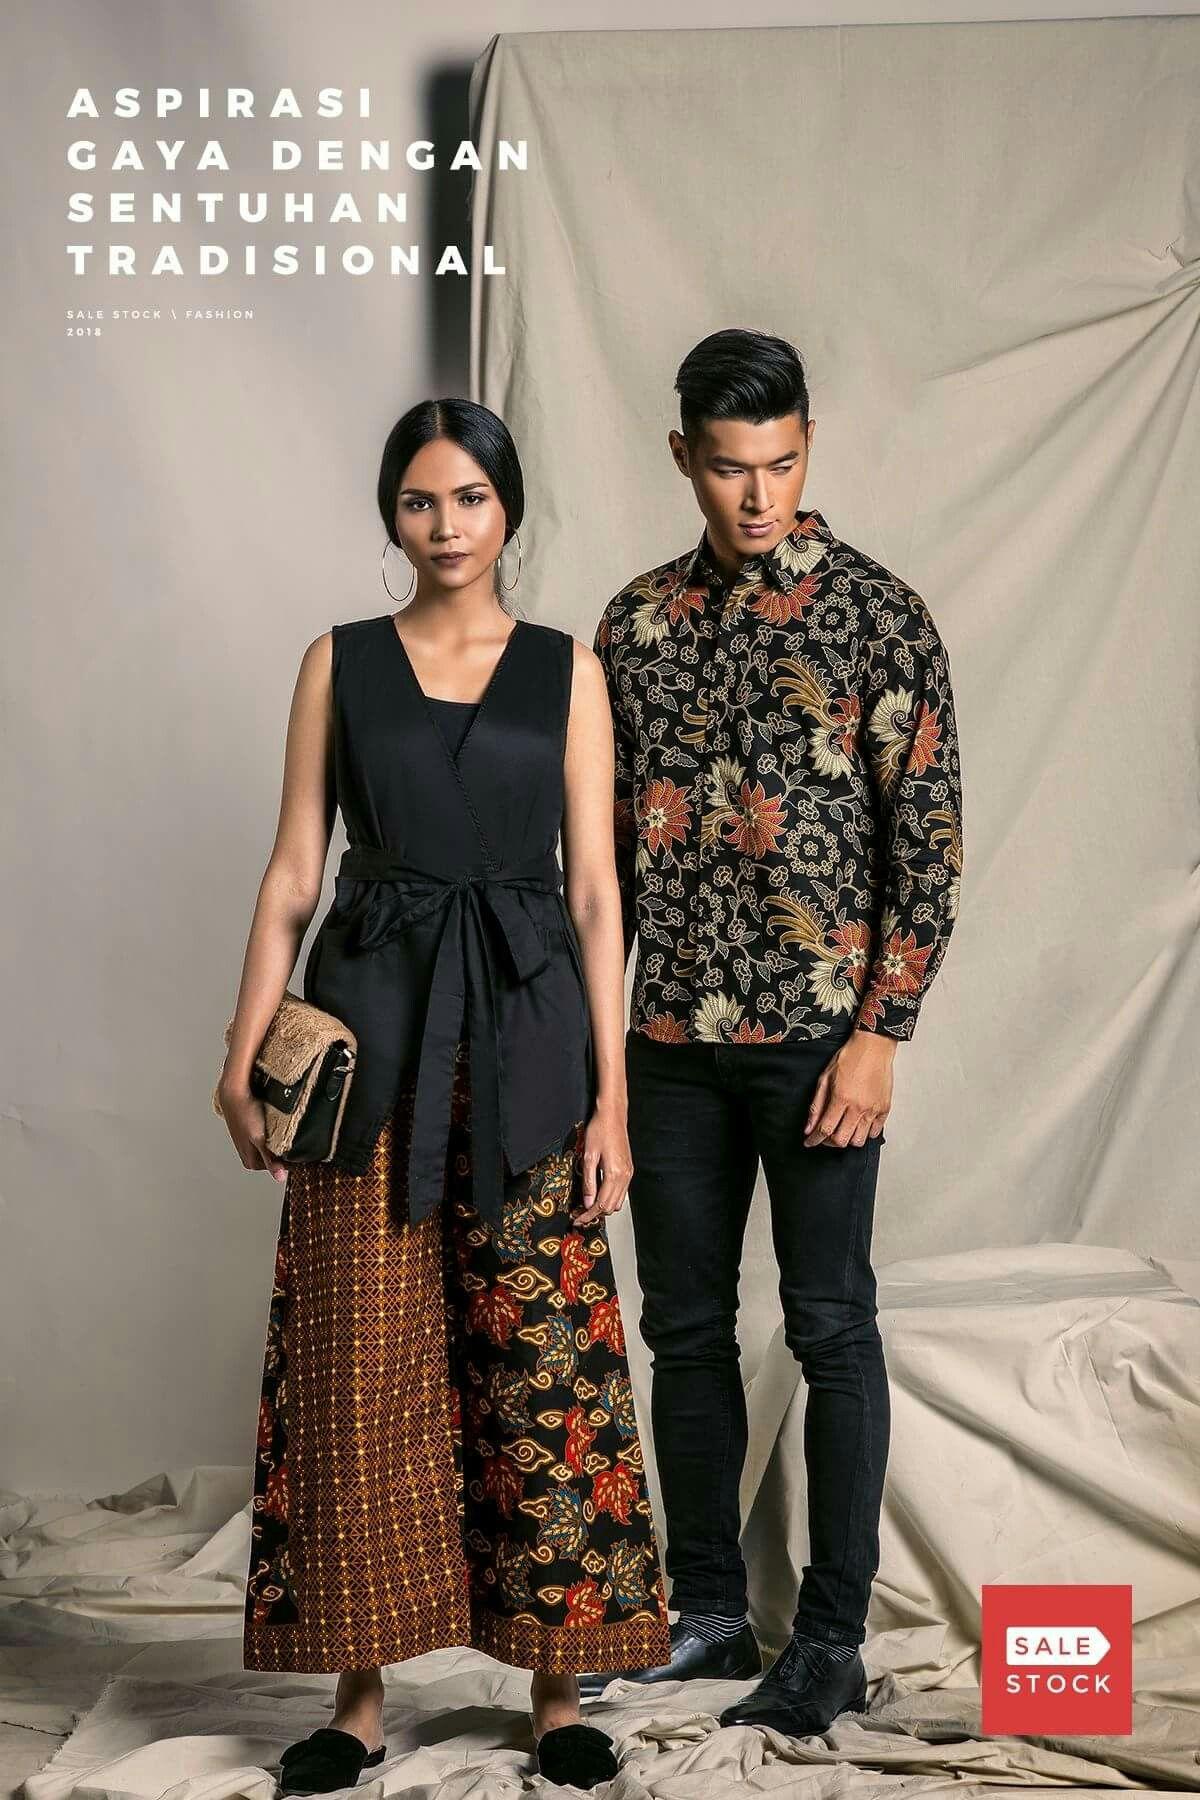 Pin By Kanti Haskarini On Batik Pinterest Dress Kebaya Ikat Rambut Anak Ariees Pants Japanese Fashion Costume Ideas